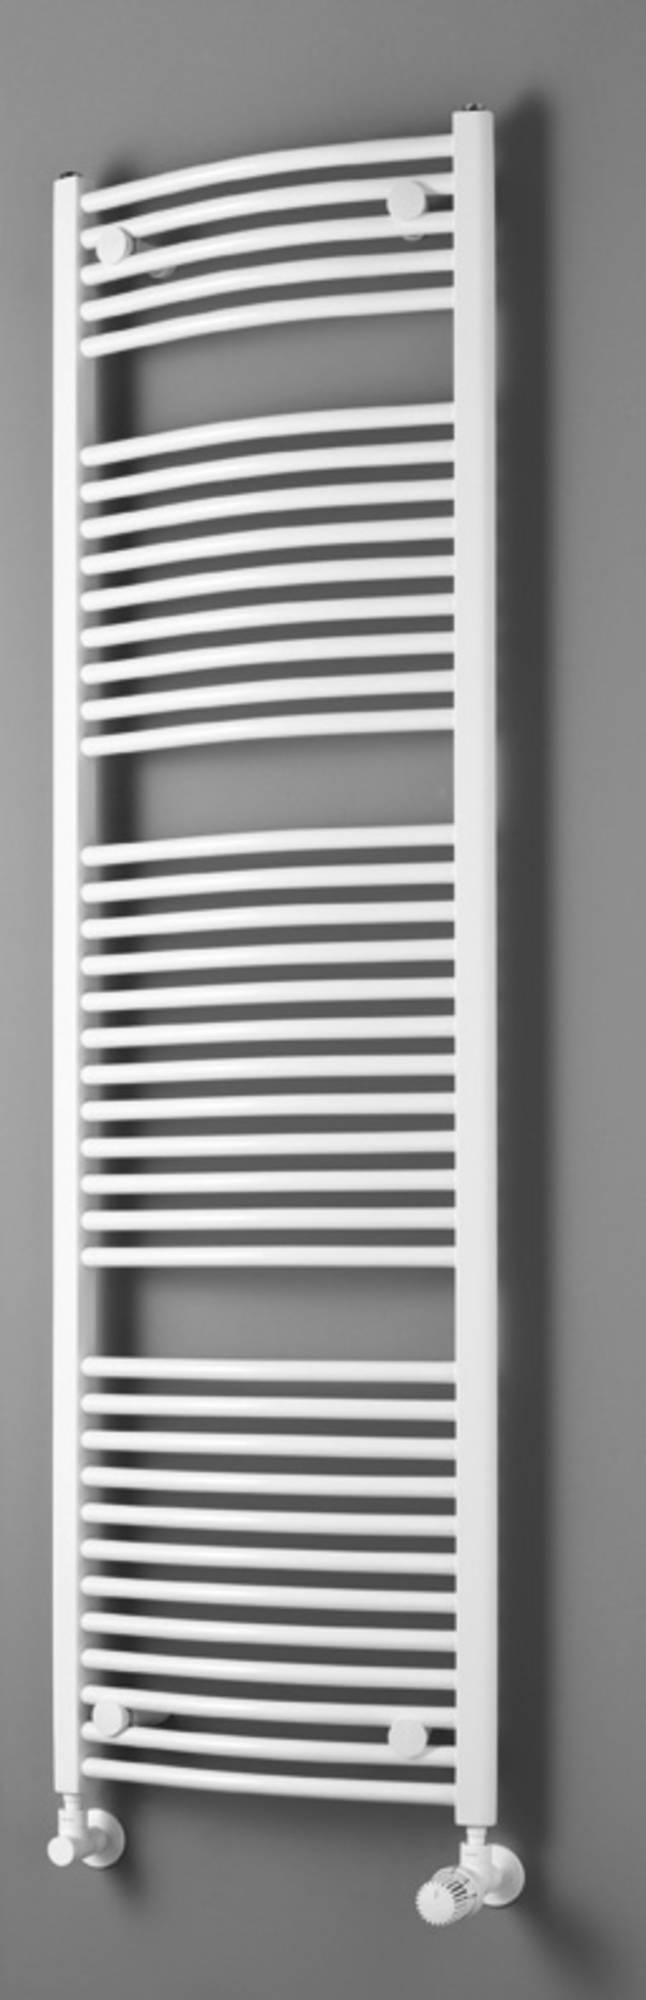 Ben Samos Designradiator 50x121,5cm 645watt Antraciet